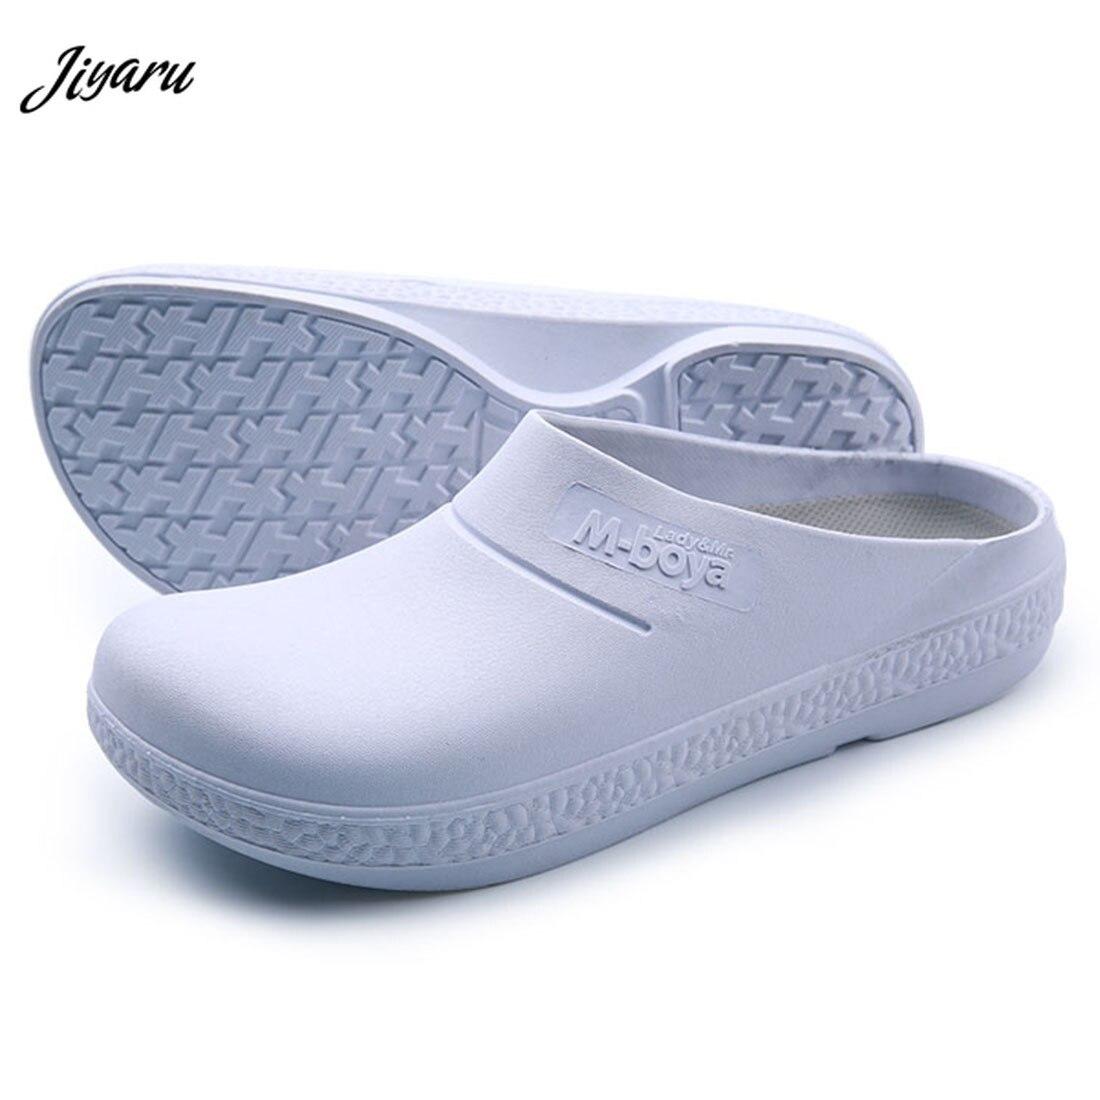 2018 New Chef Restaurant Kitchen Work Shoes Men Medical Doctors Nurses Surgical Work Shoes Non-slip Protective Sandal Men Shoes